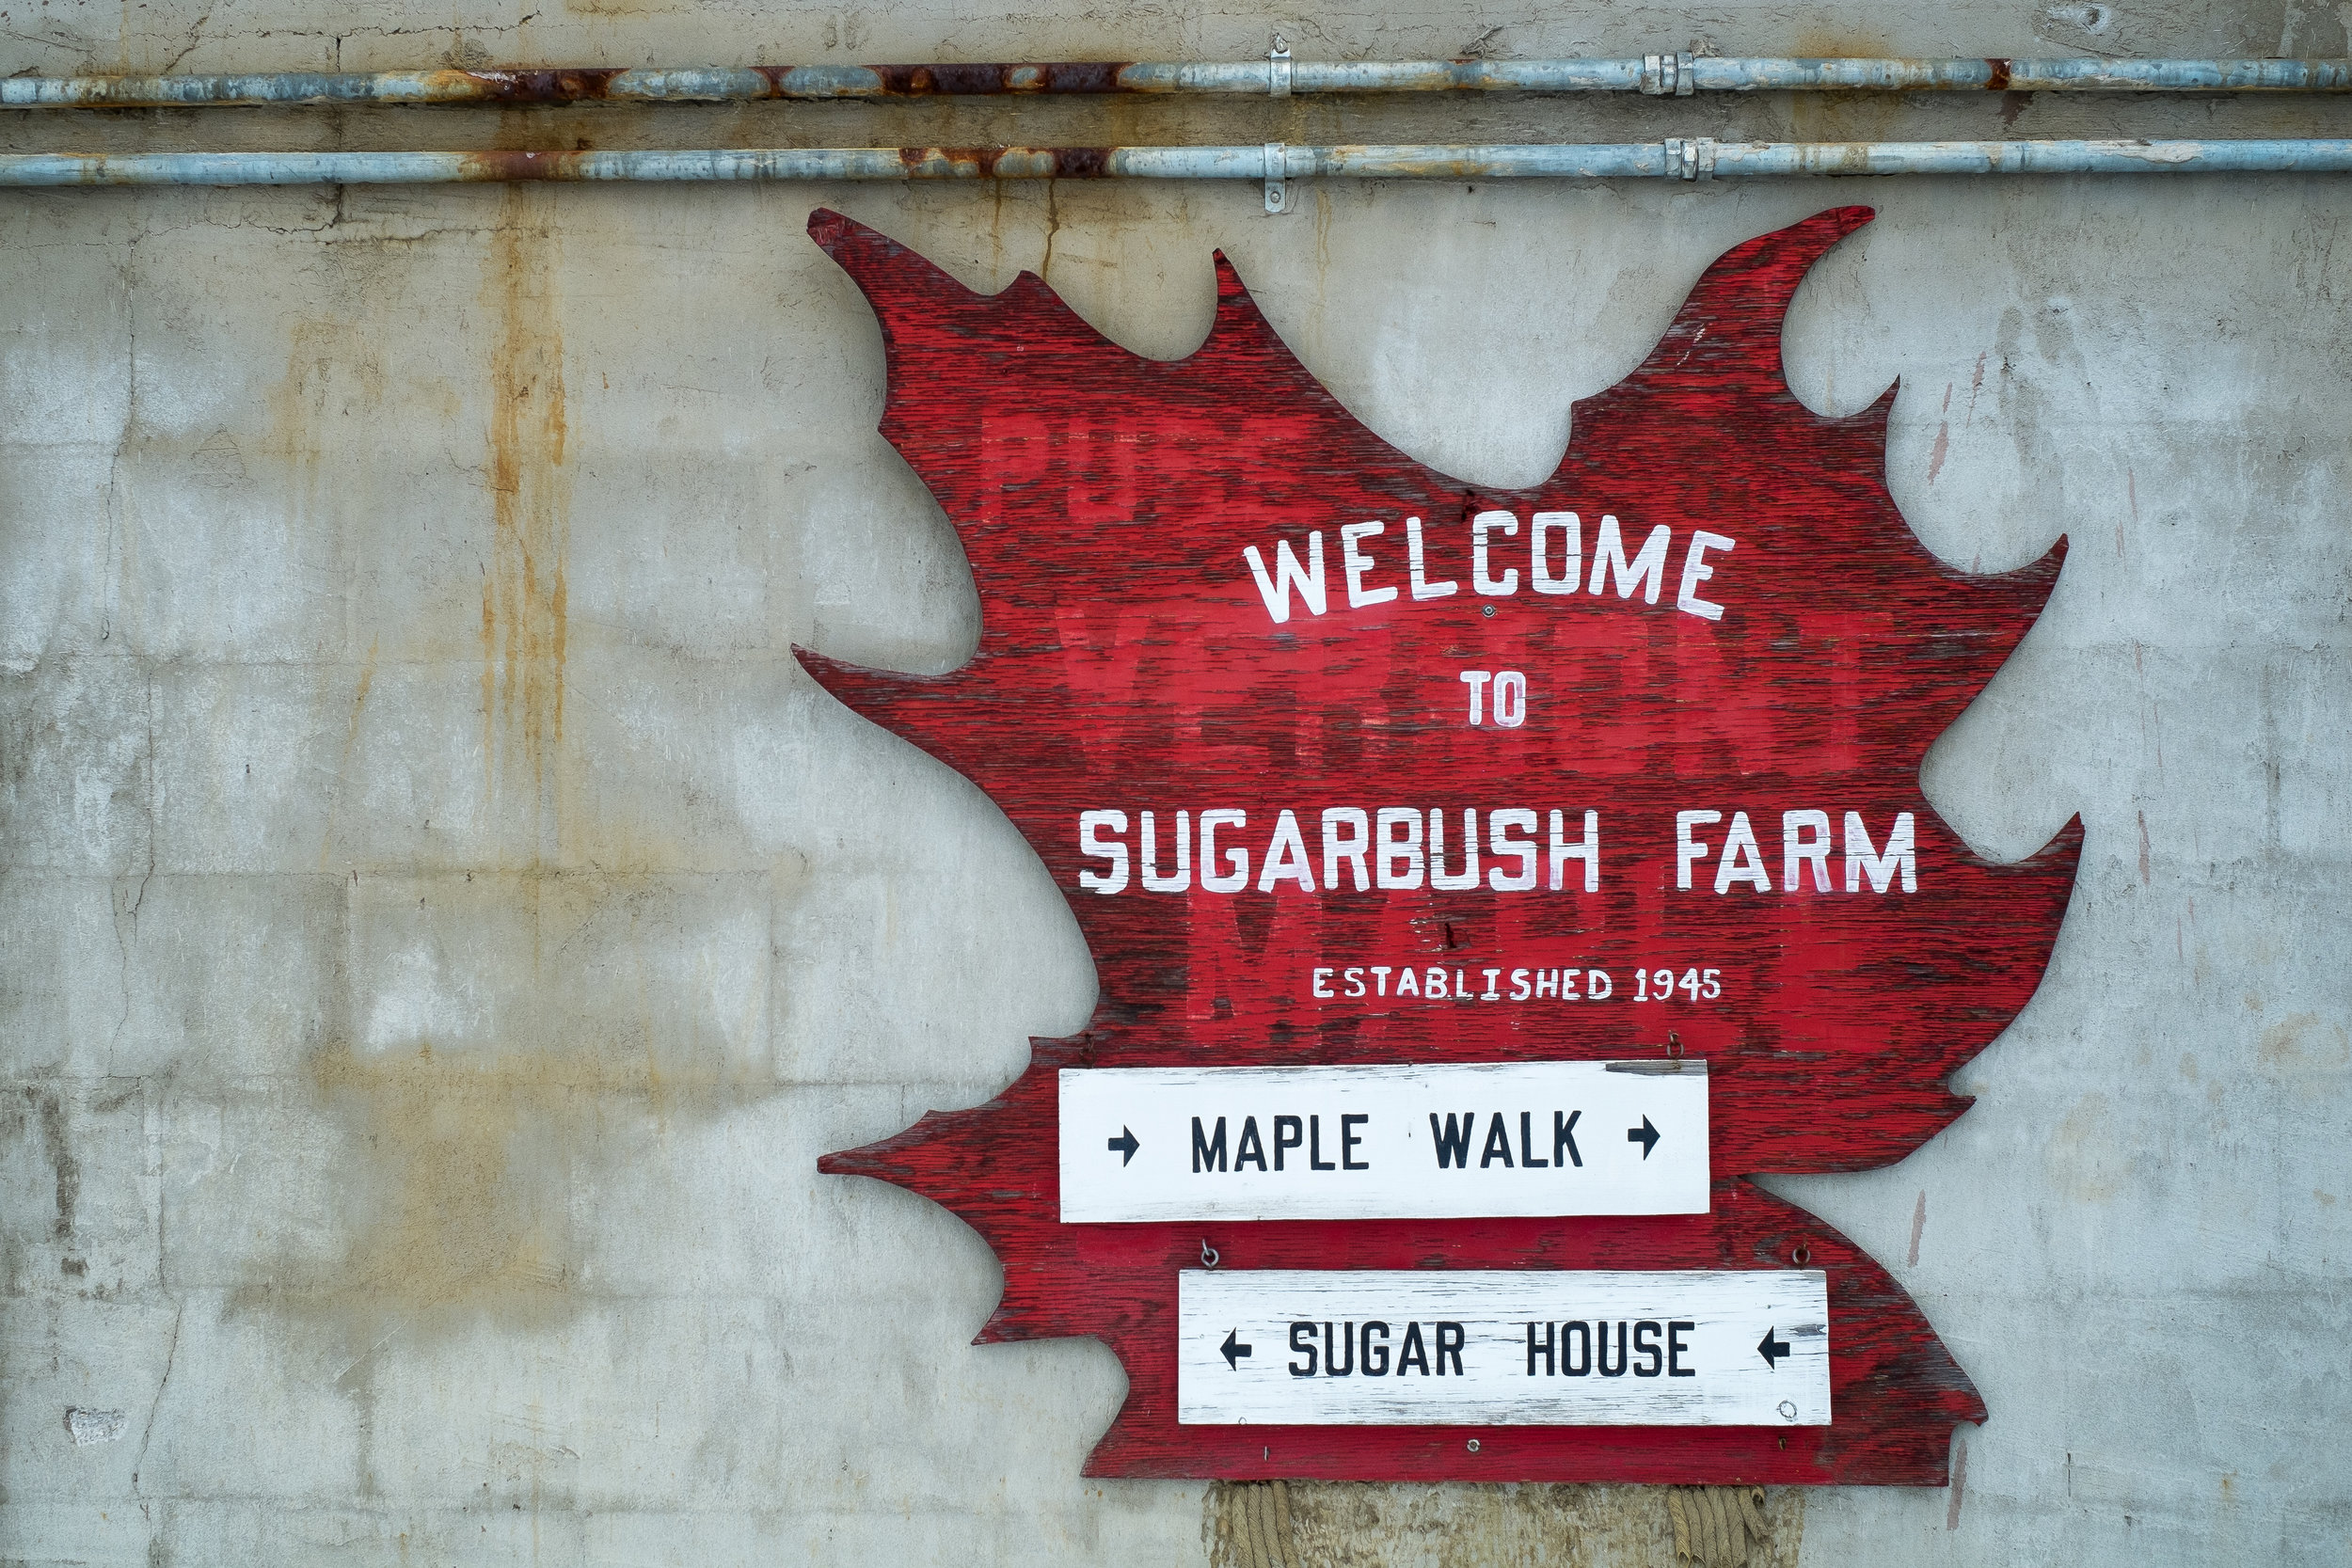 Maple Walk Sugar House